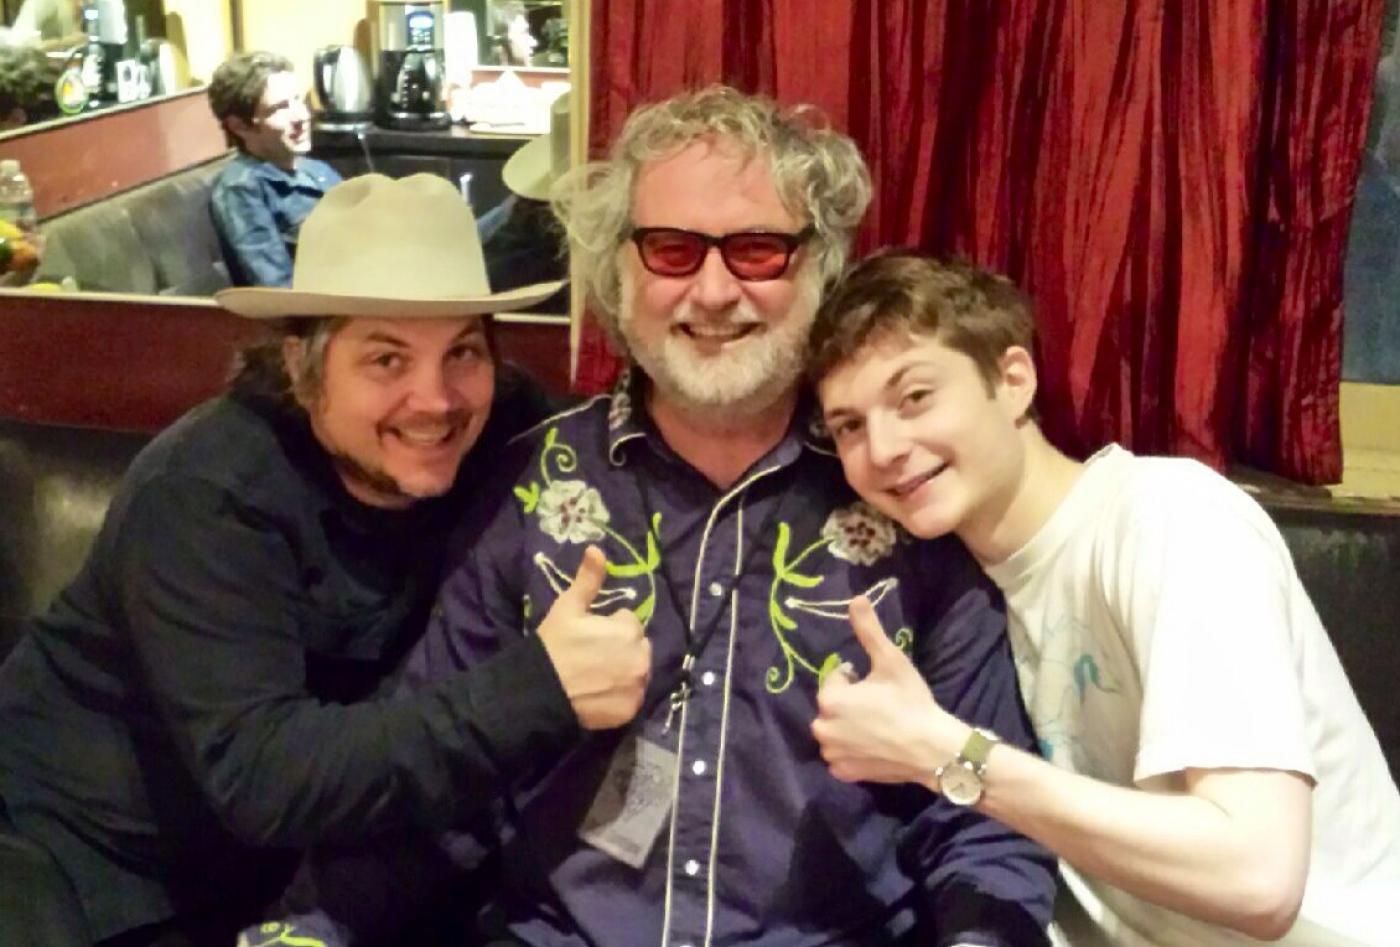 Luke, Grandpappy Amos, and Lil Luke